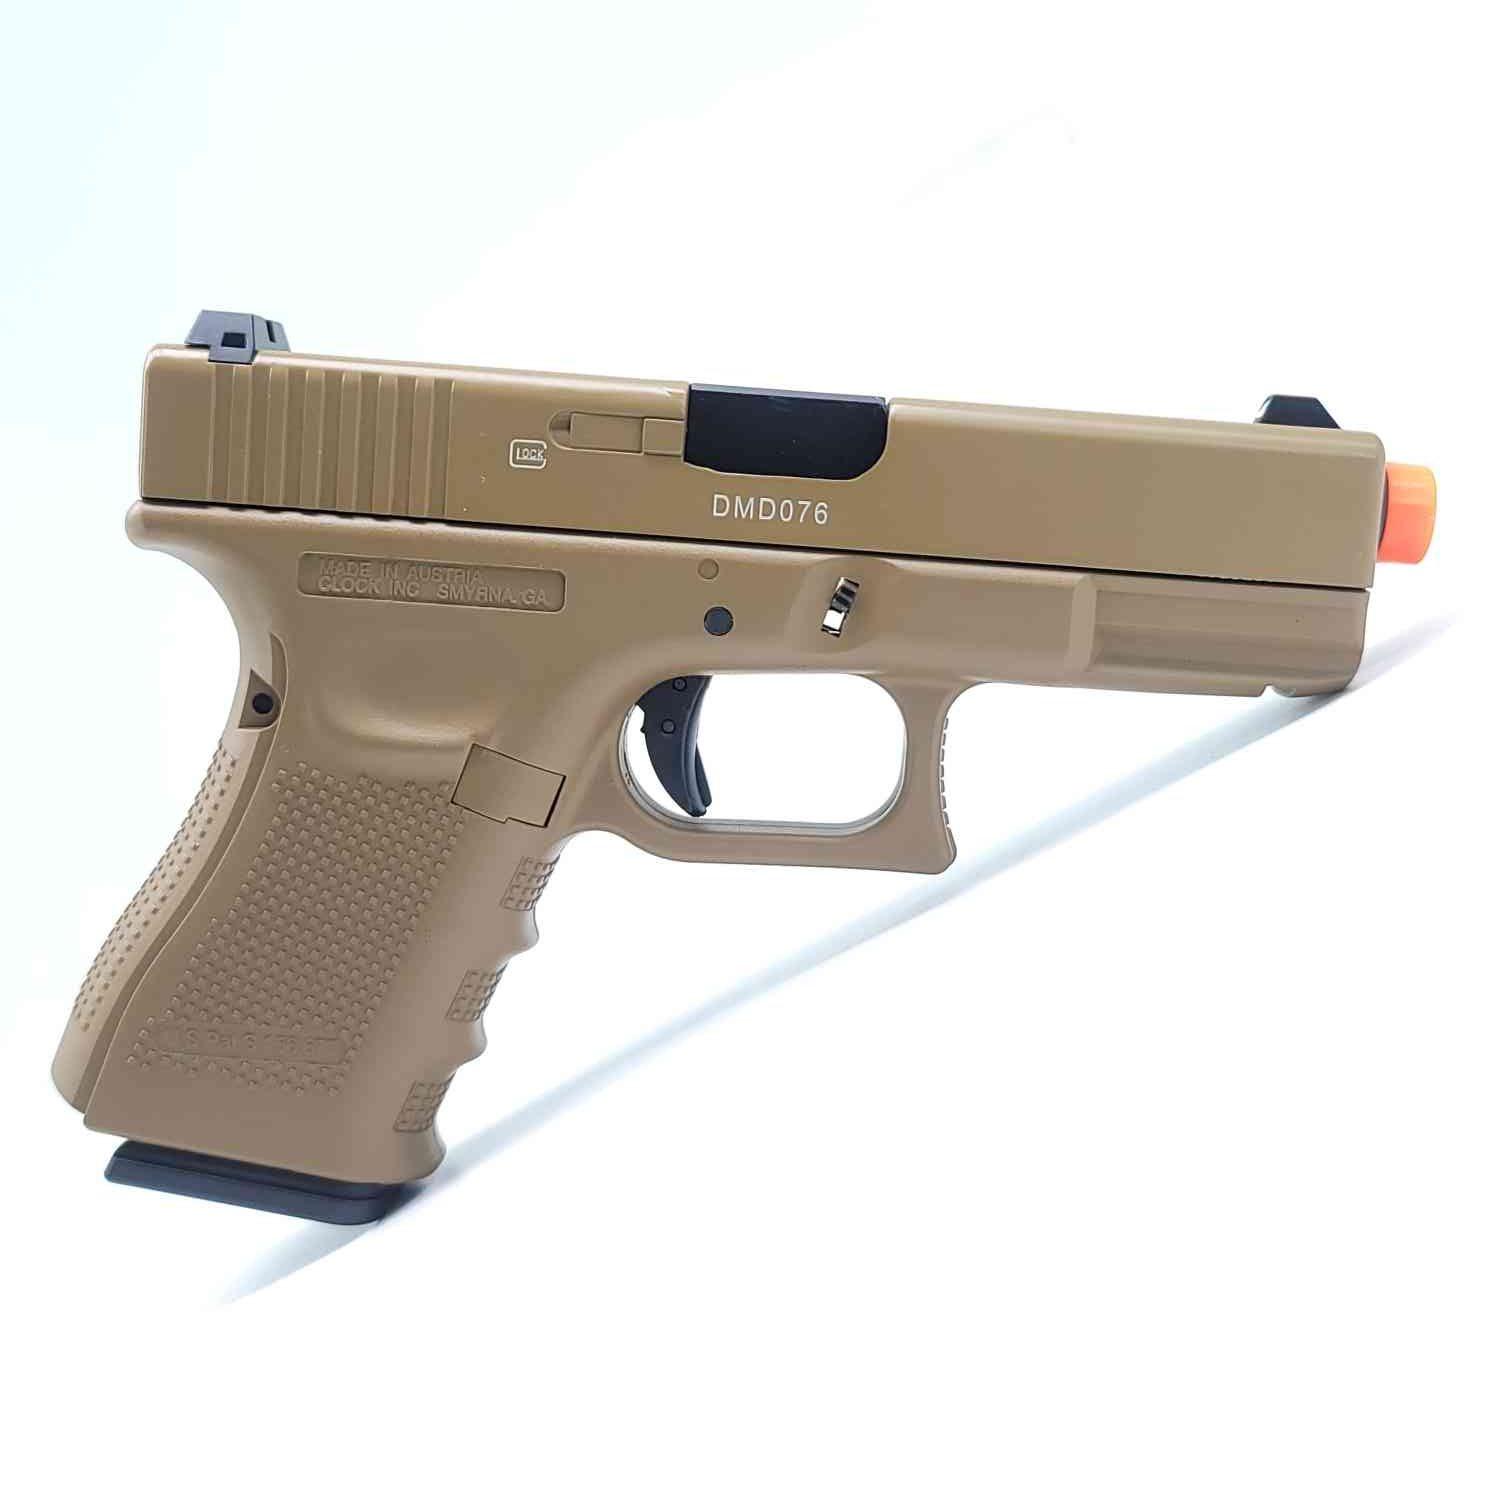 DOUBLE BELL Glock G19 GEN4 Gas Powered Gel Blaster TAN [772S] Renegade Blasters